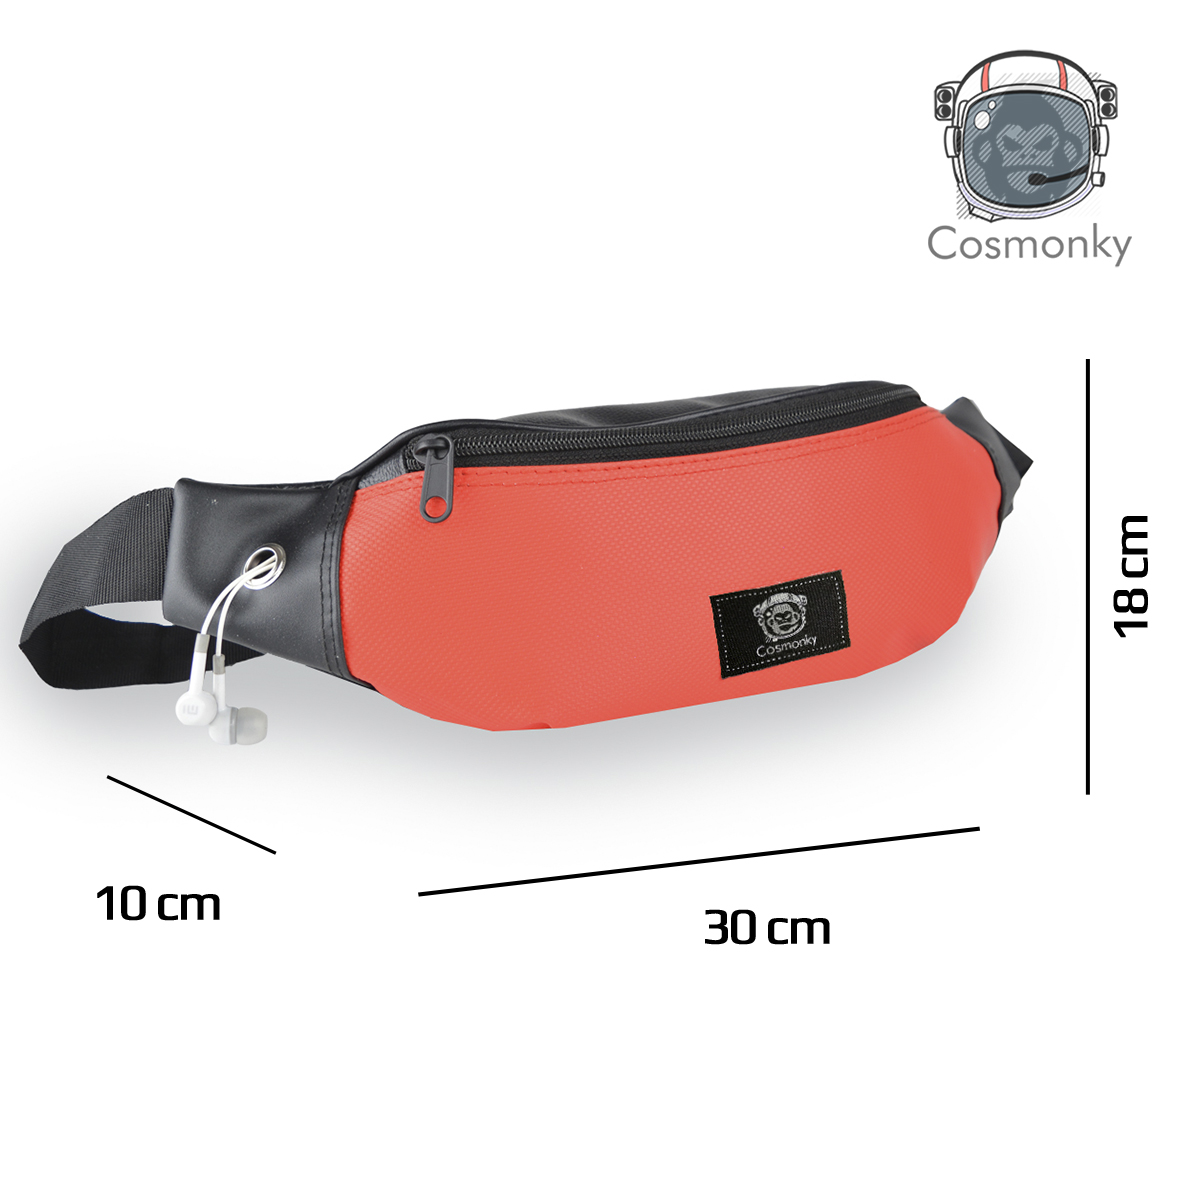 promo tas pinggang waistbag cosmonky piston /tas kulit / crossbody bags / tas selempang casual / tas organizer / tas /revers